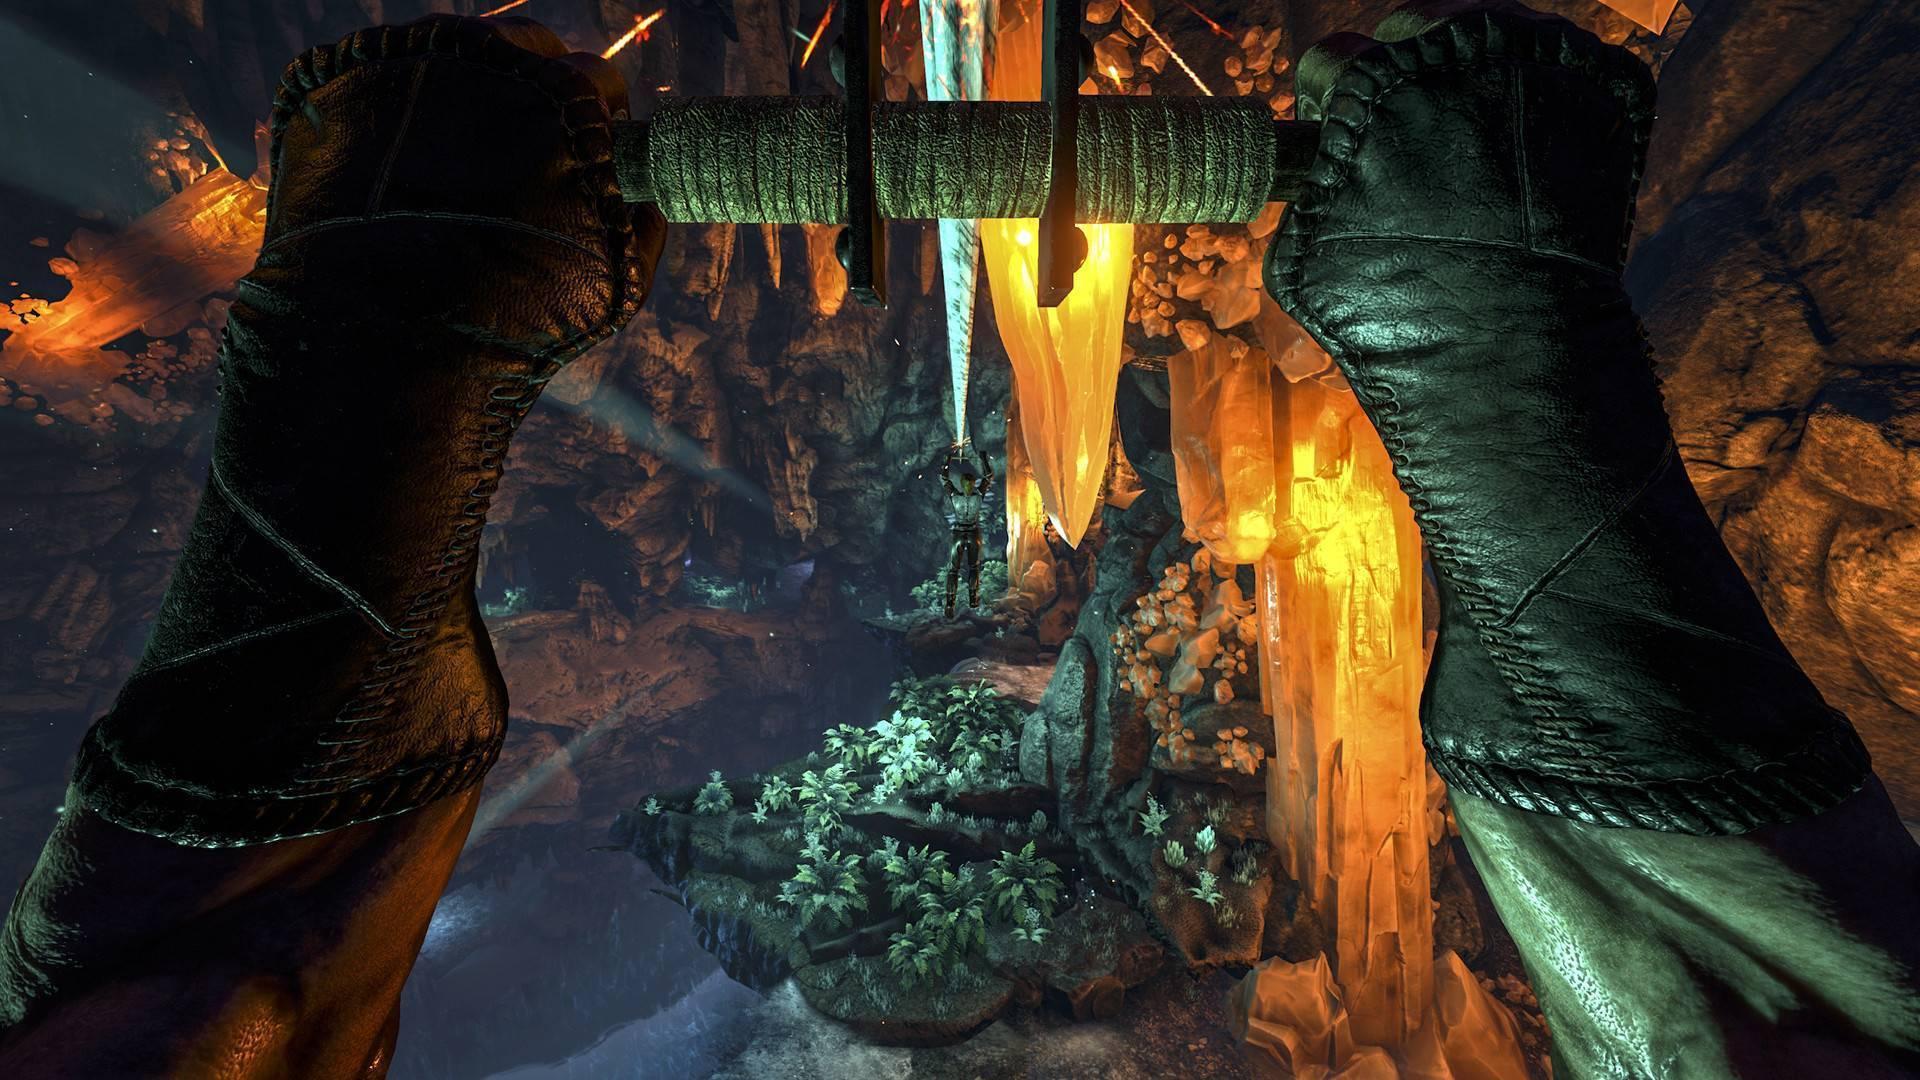 Hd Wallpaper Zip Pack Free Download Buy Ark Survival Evolved Season Pass Pc Cd Key For Steam